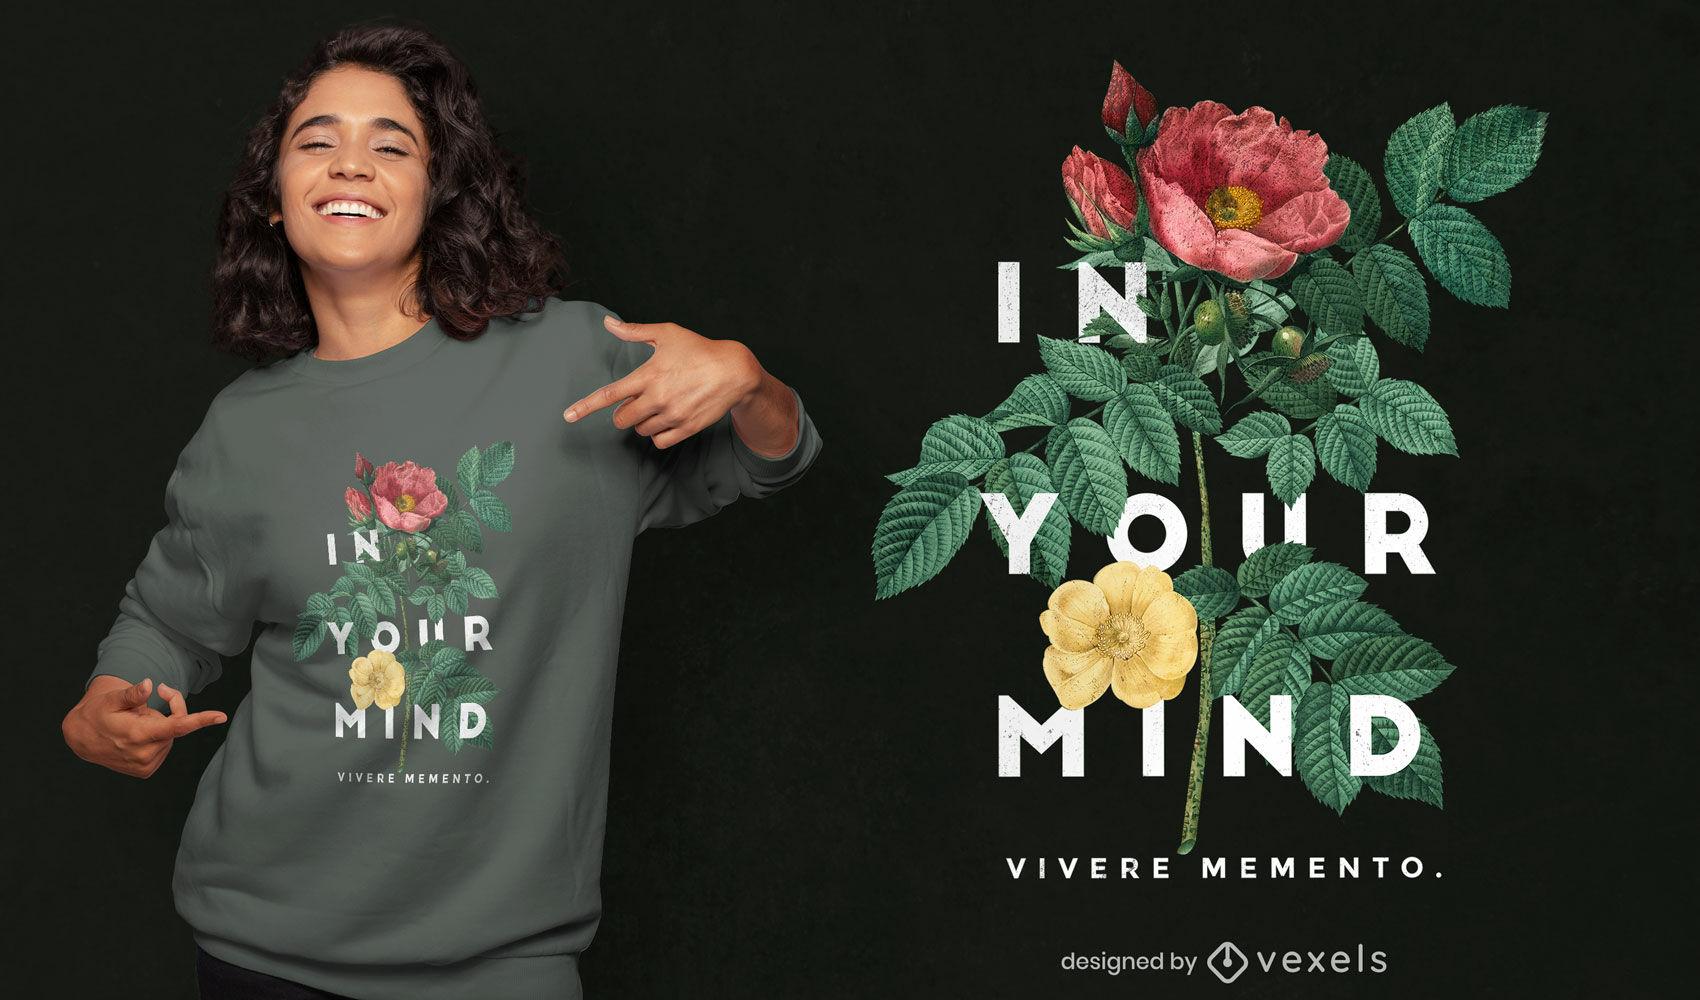 Blumen und Bl?tter fotografisches T-Shirt psd